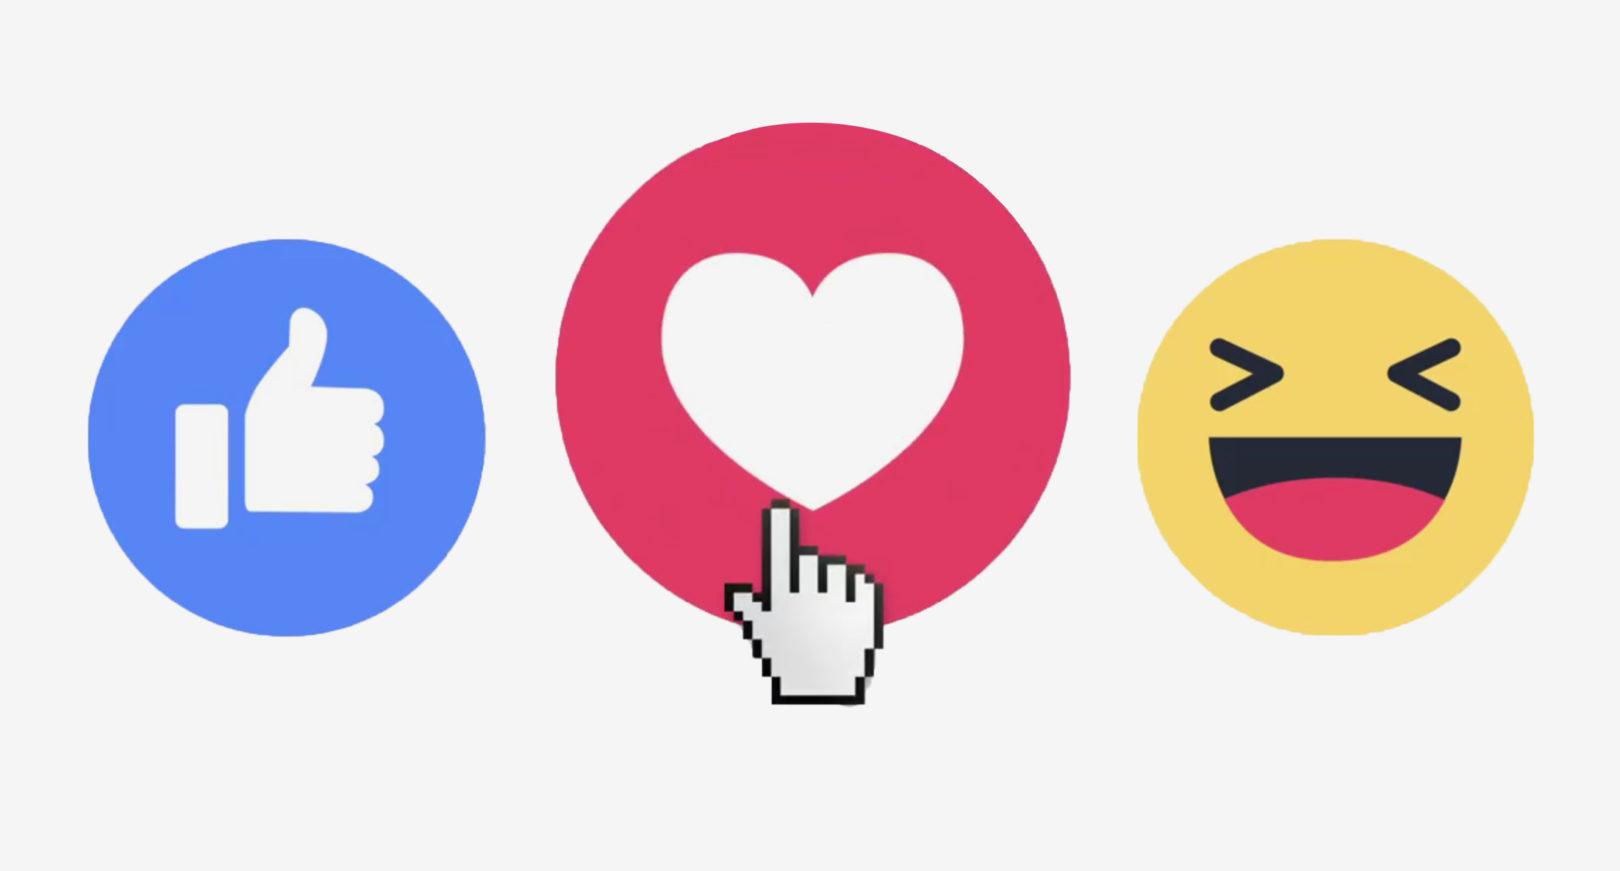 Fejsbuk vvel reakcii na kommentarii